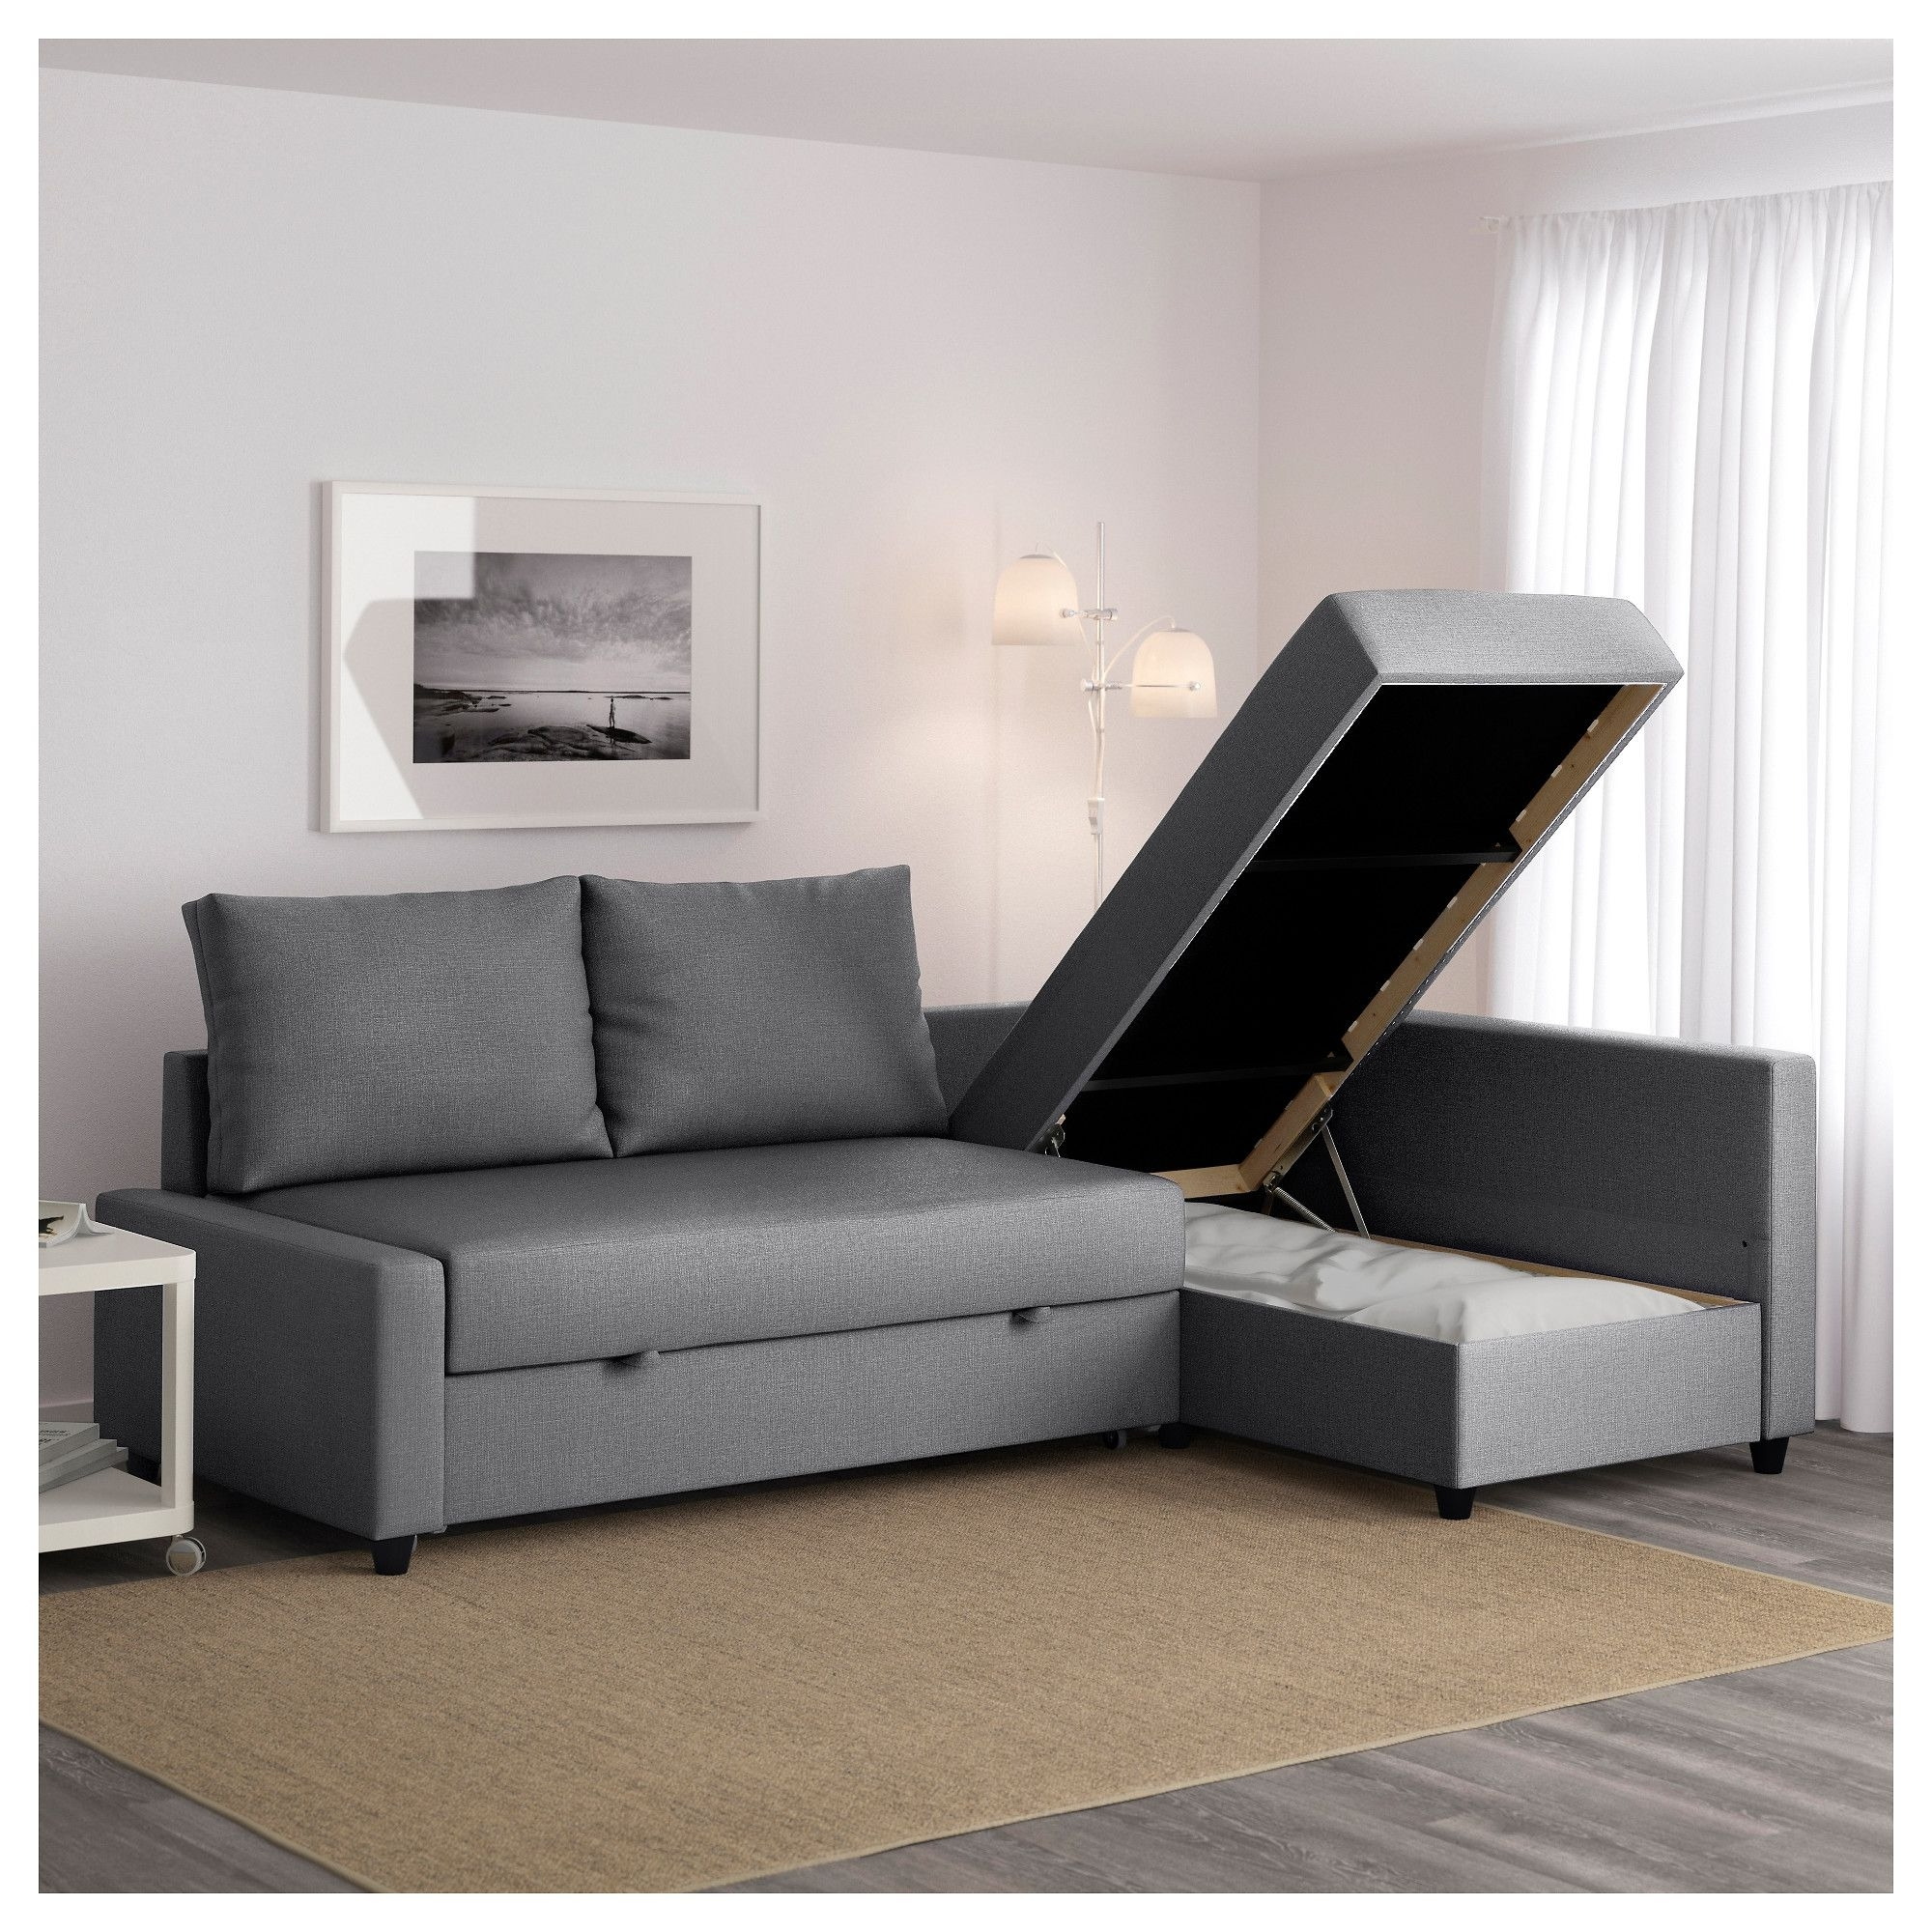 Ikea Corner Sofas With Storage In Best And Newest Friheten Corner Sofa Bed With Storage Skiftebo Dark Grey (View 3 of 20)